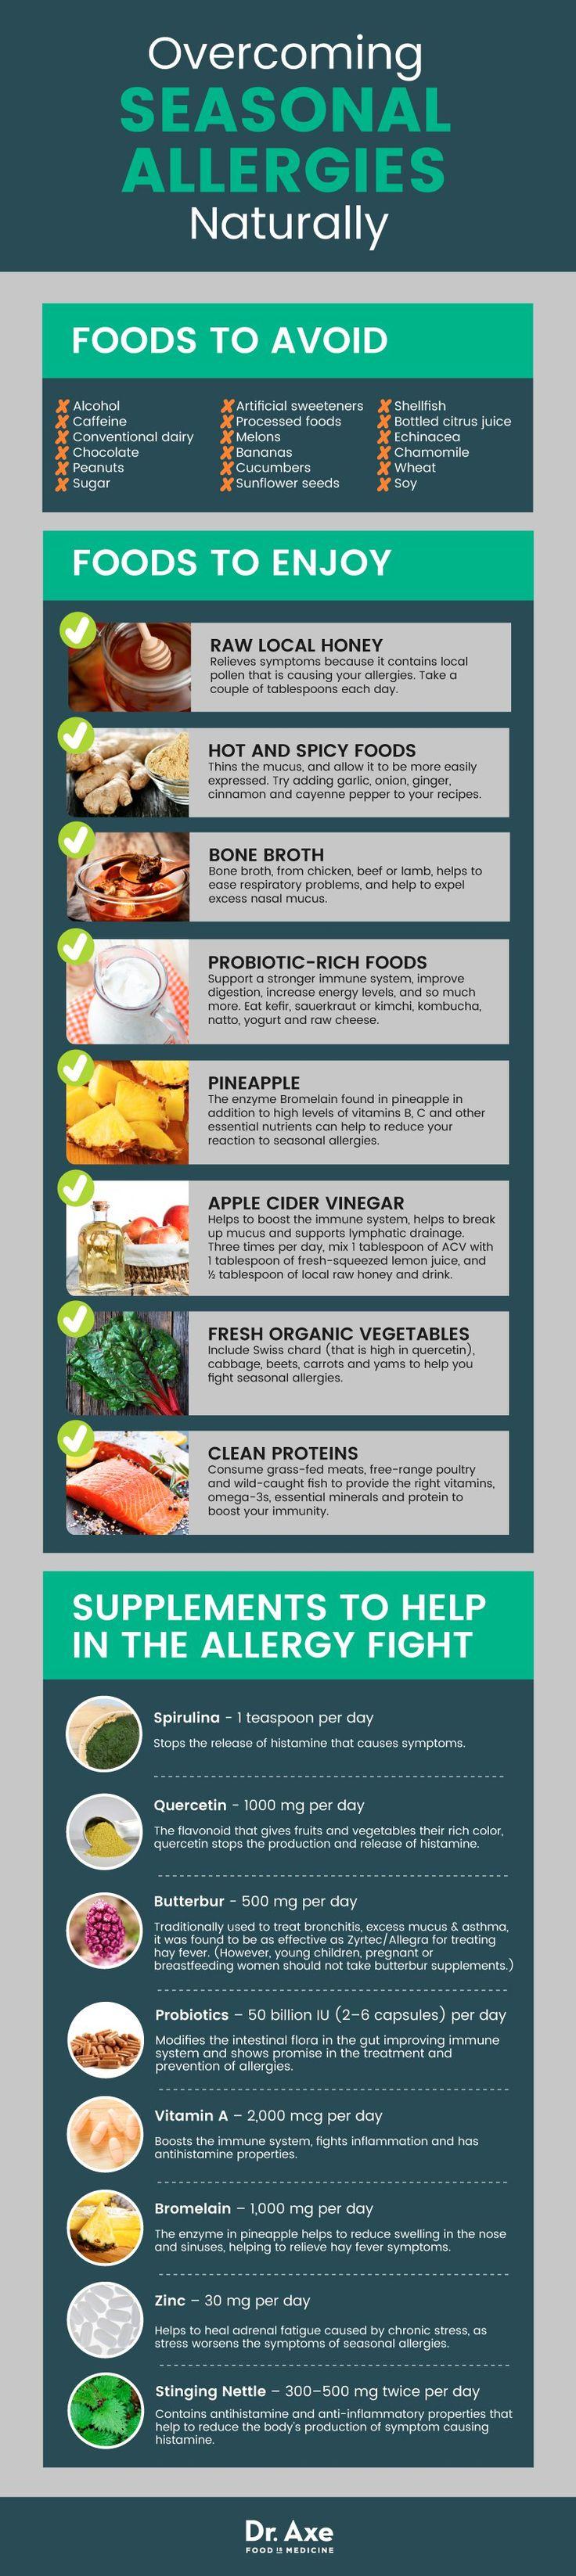 Seasonal Allergy Symptoms: Natural Treatments